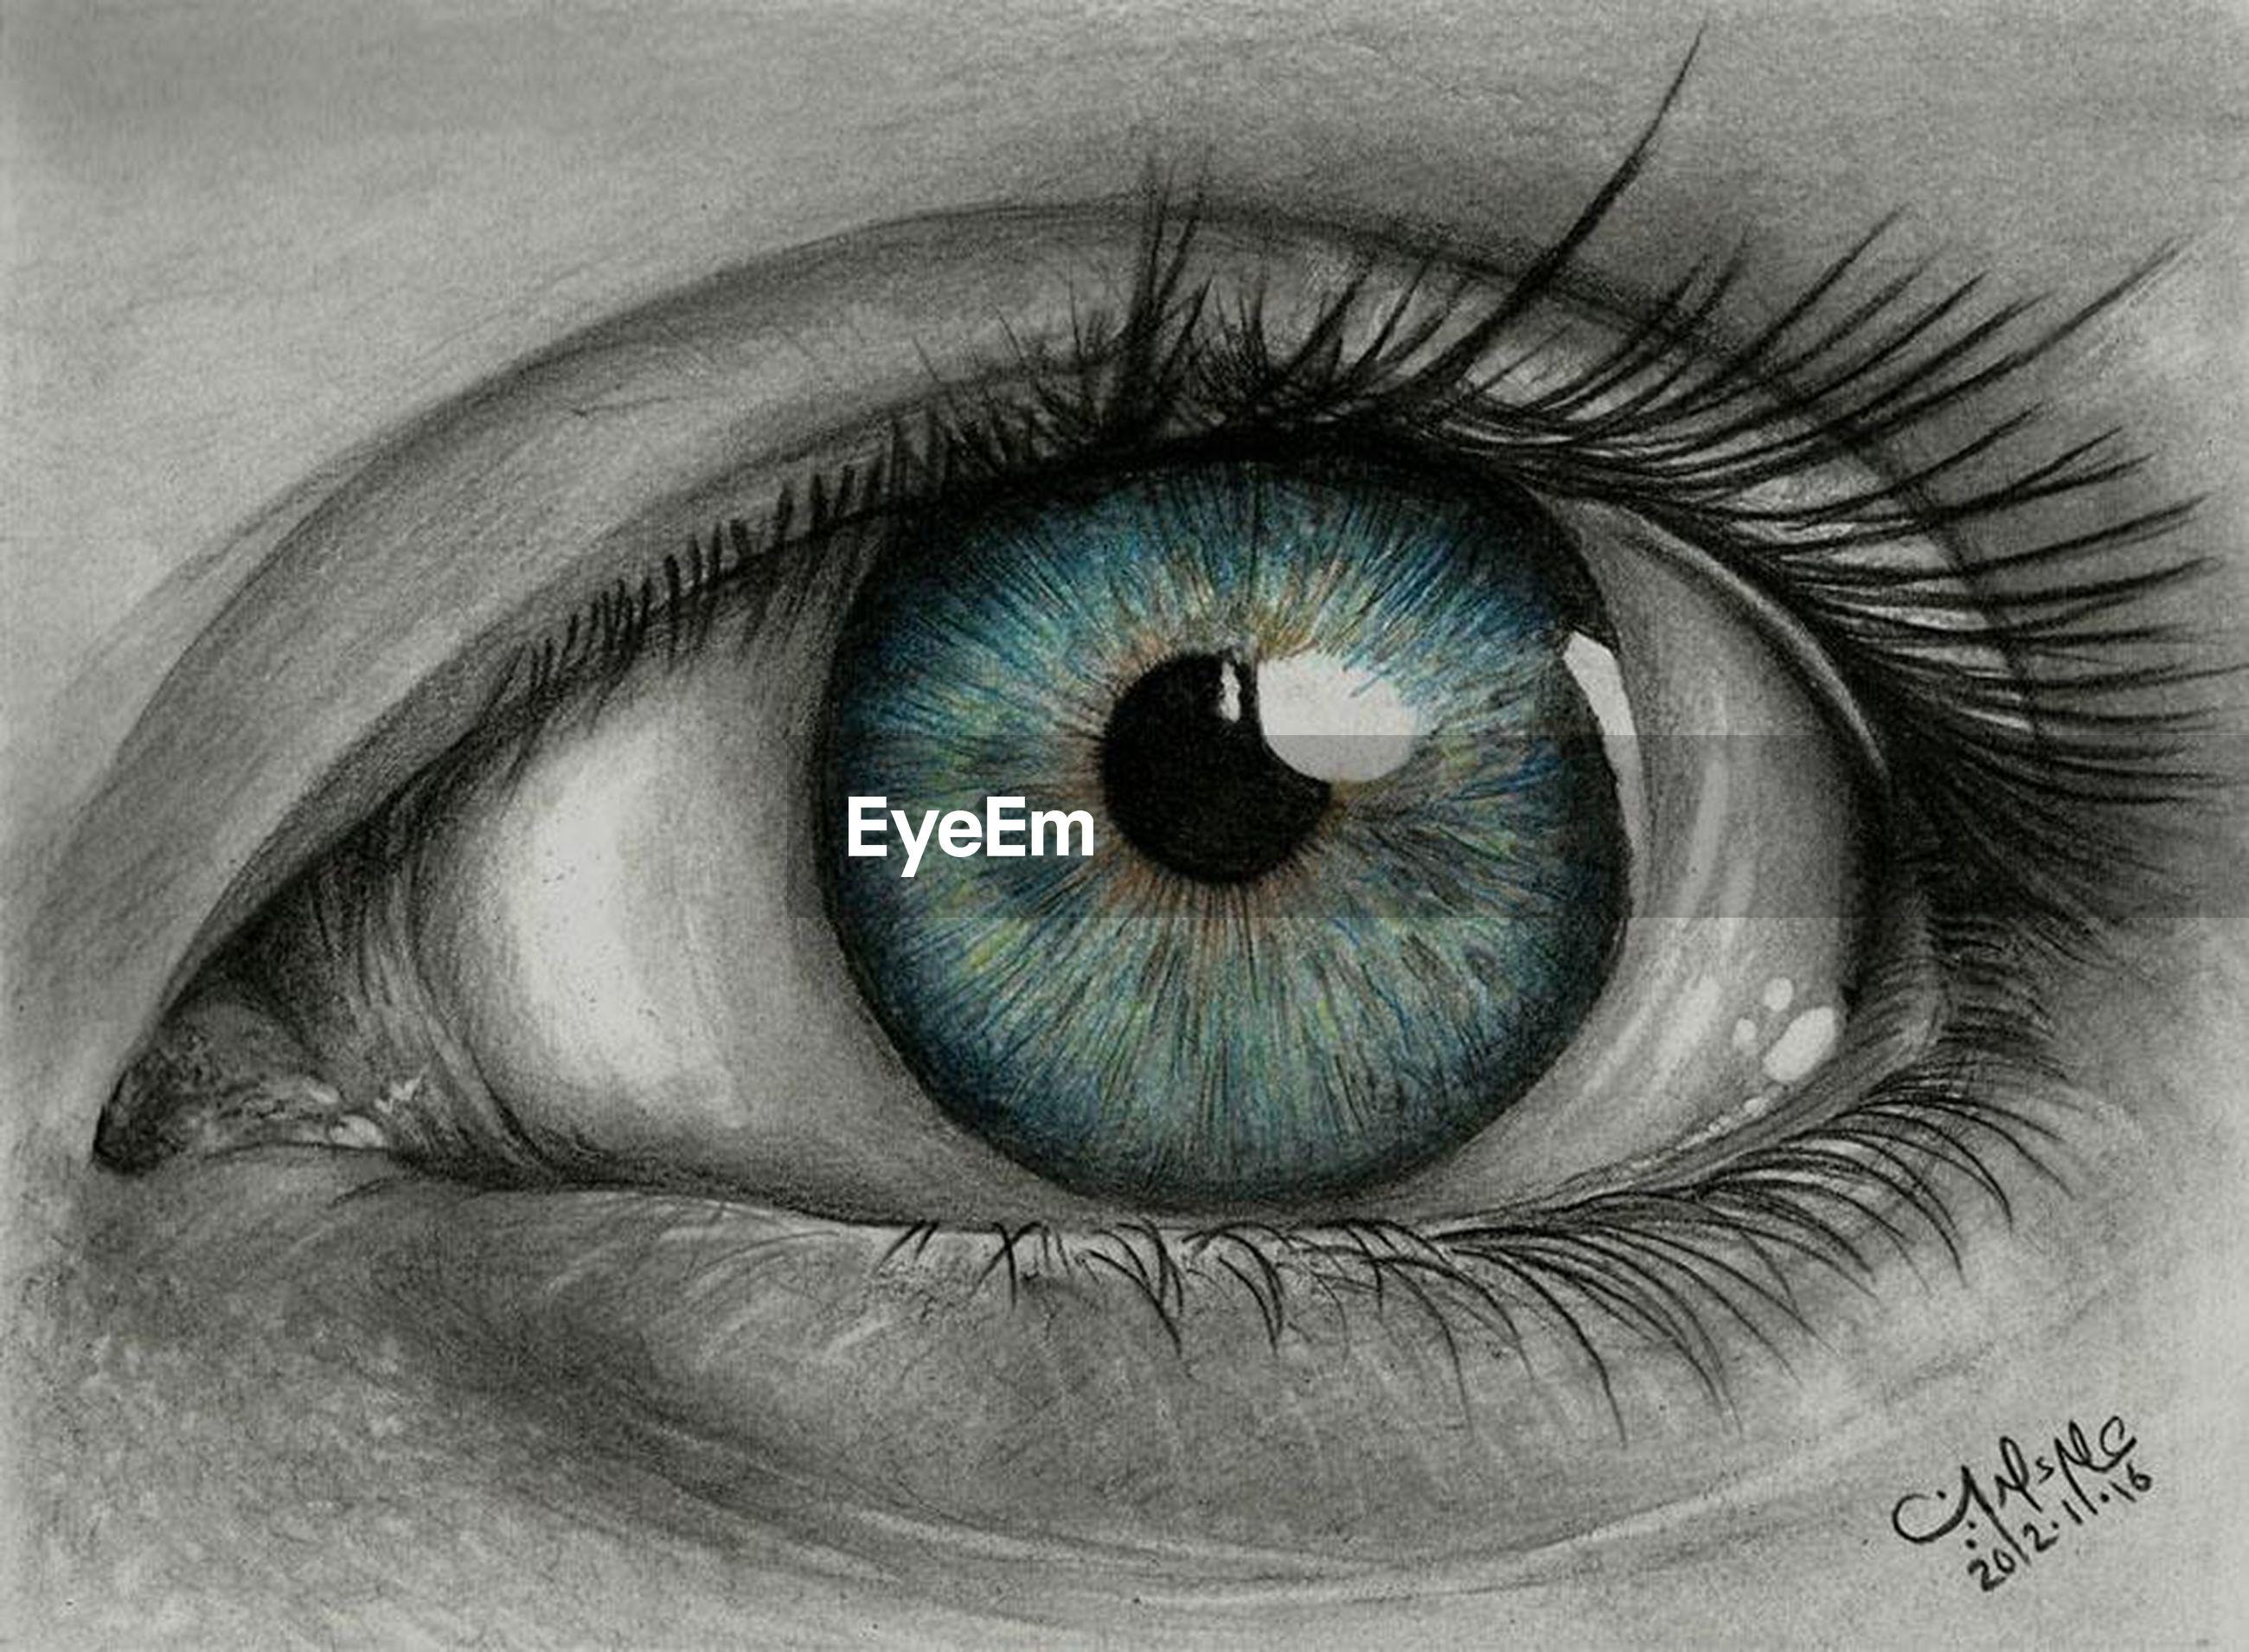 human eye, eyelash, eyesight, sensory perception, close-up, looking at camera, portrait, iris - eye, eyeball, part of, extreme close-up, indoors, full frame, human skin, vision, unrecognizable person, person